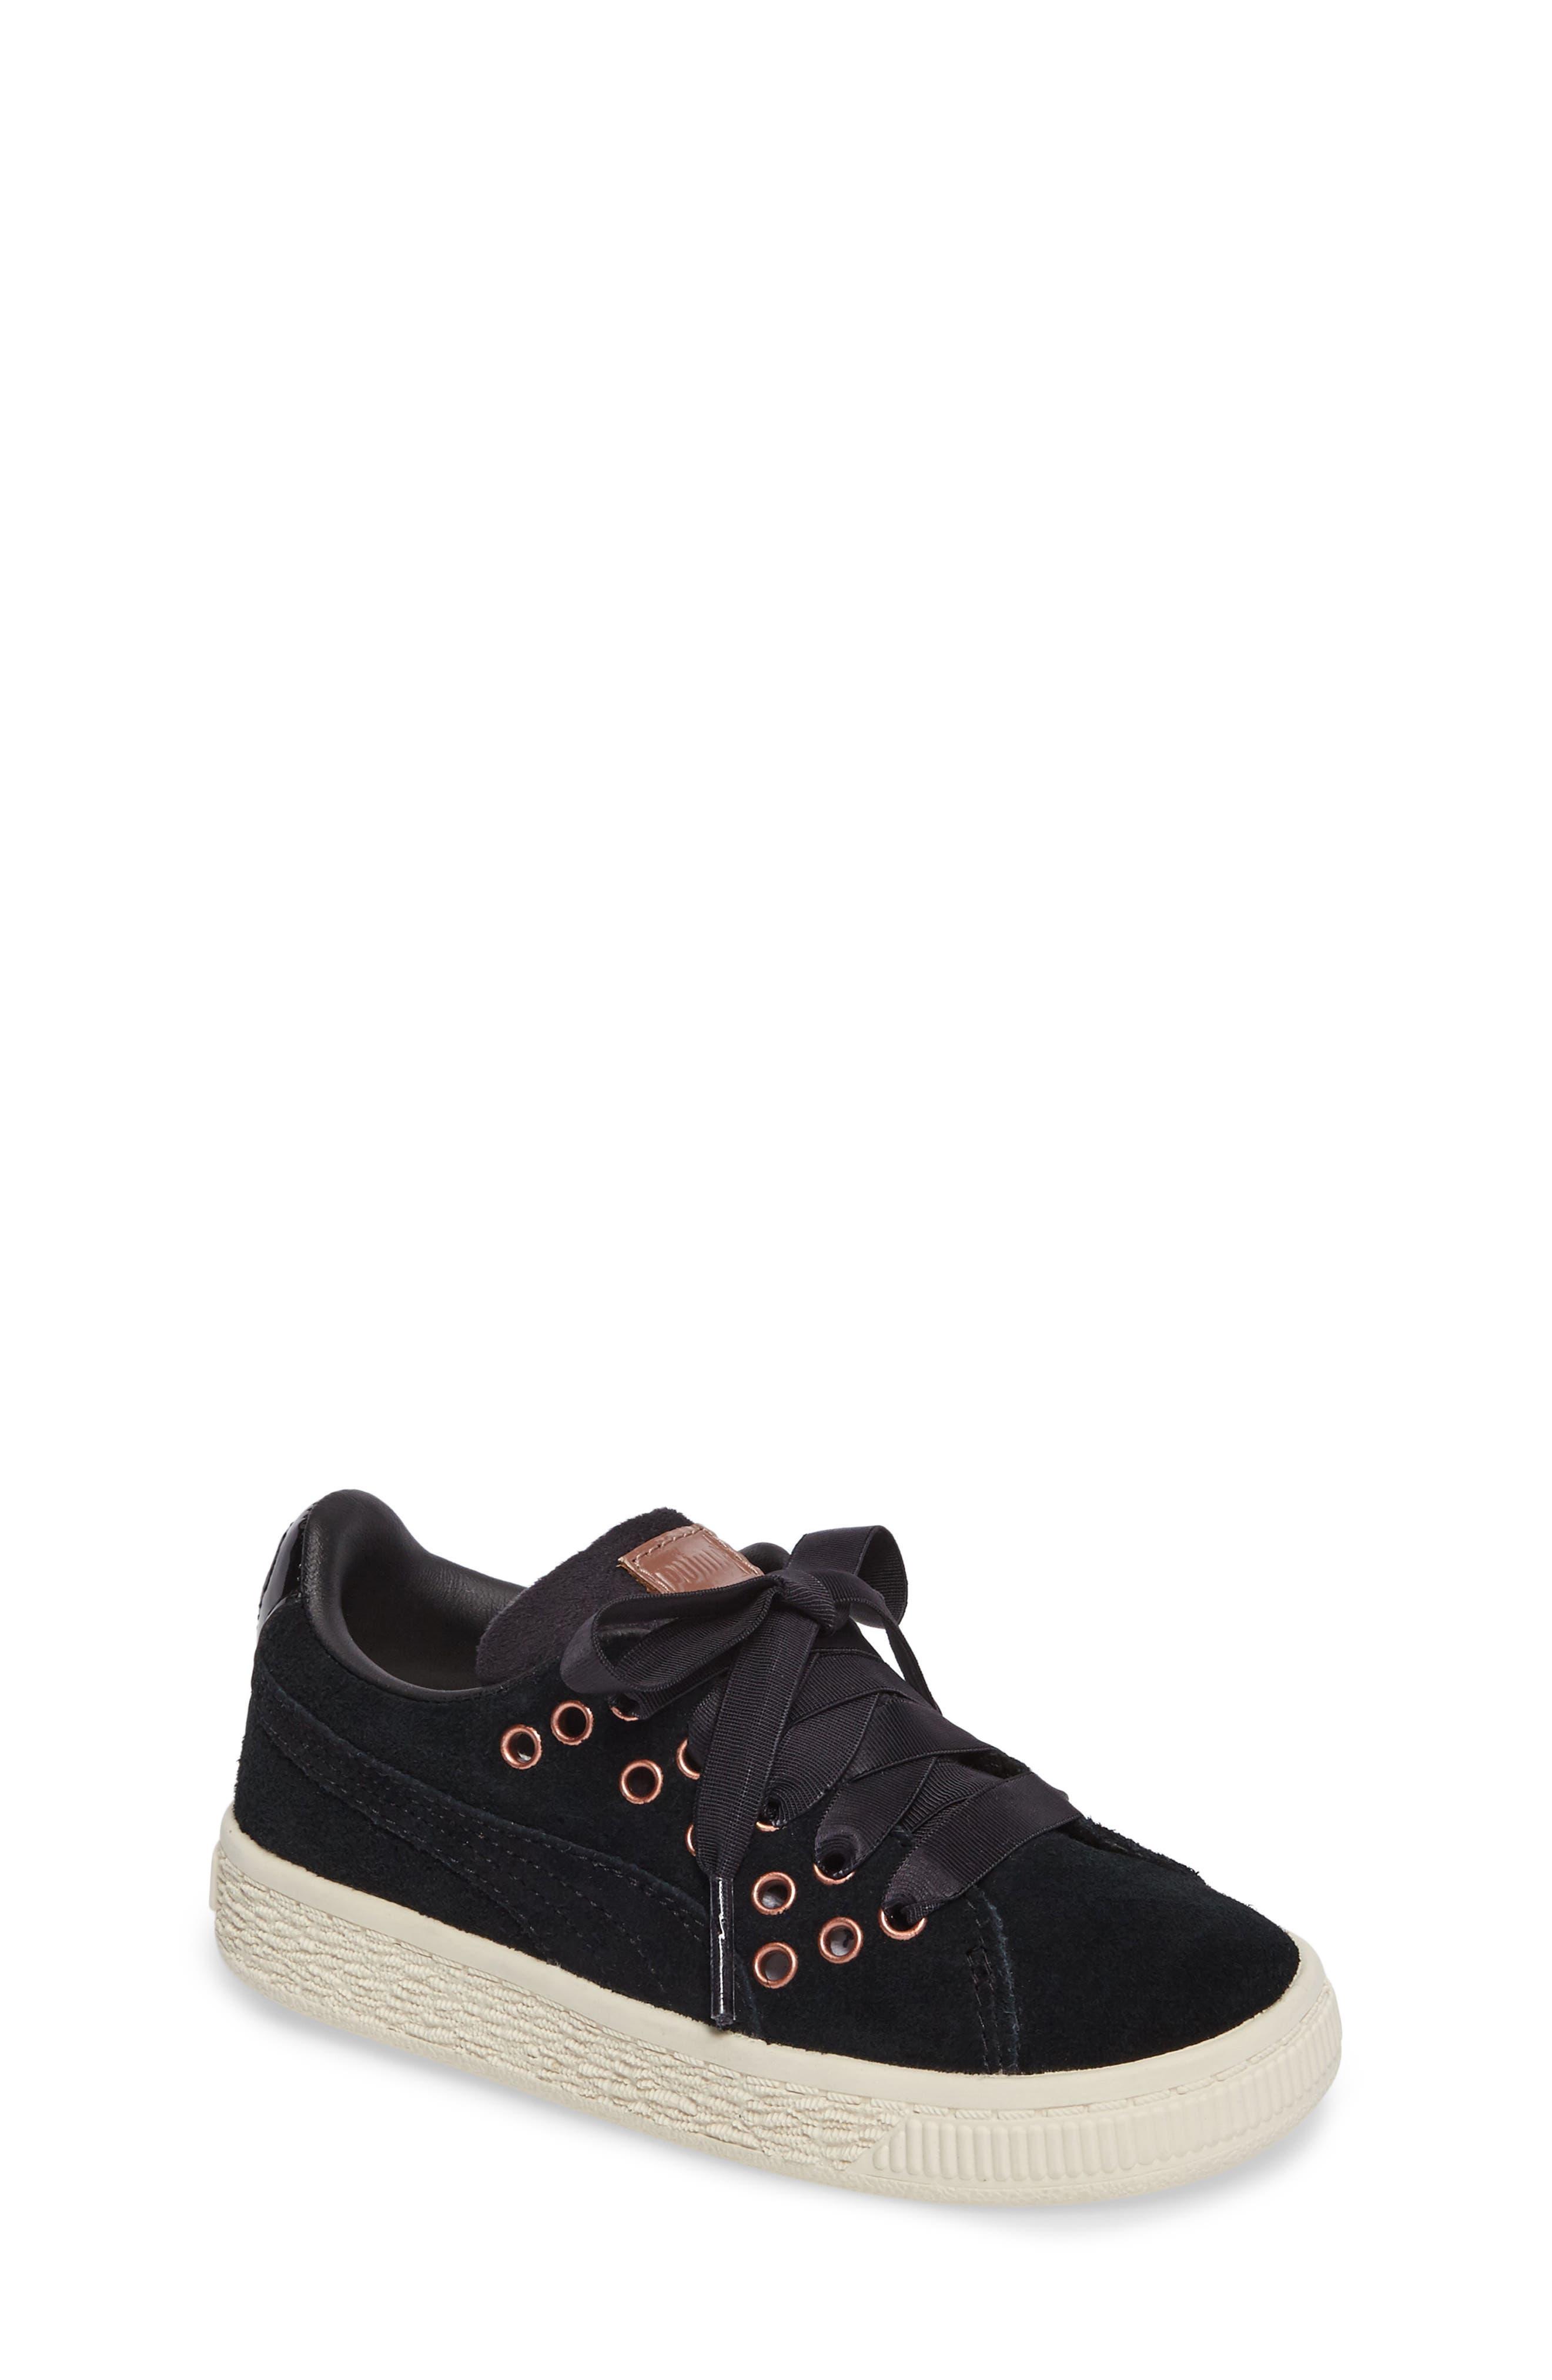 PUMA Suede XL Sneaker (Baby, Walker & Toddler)